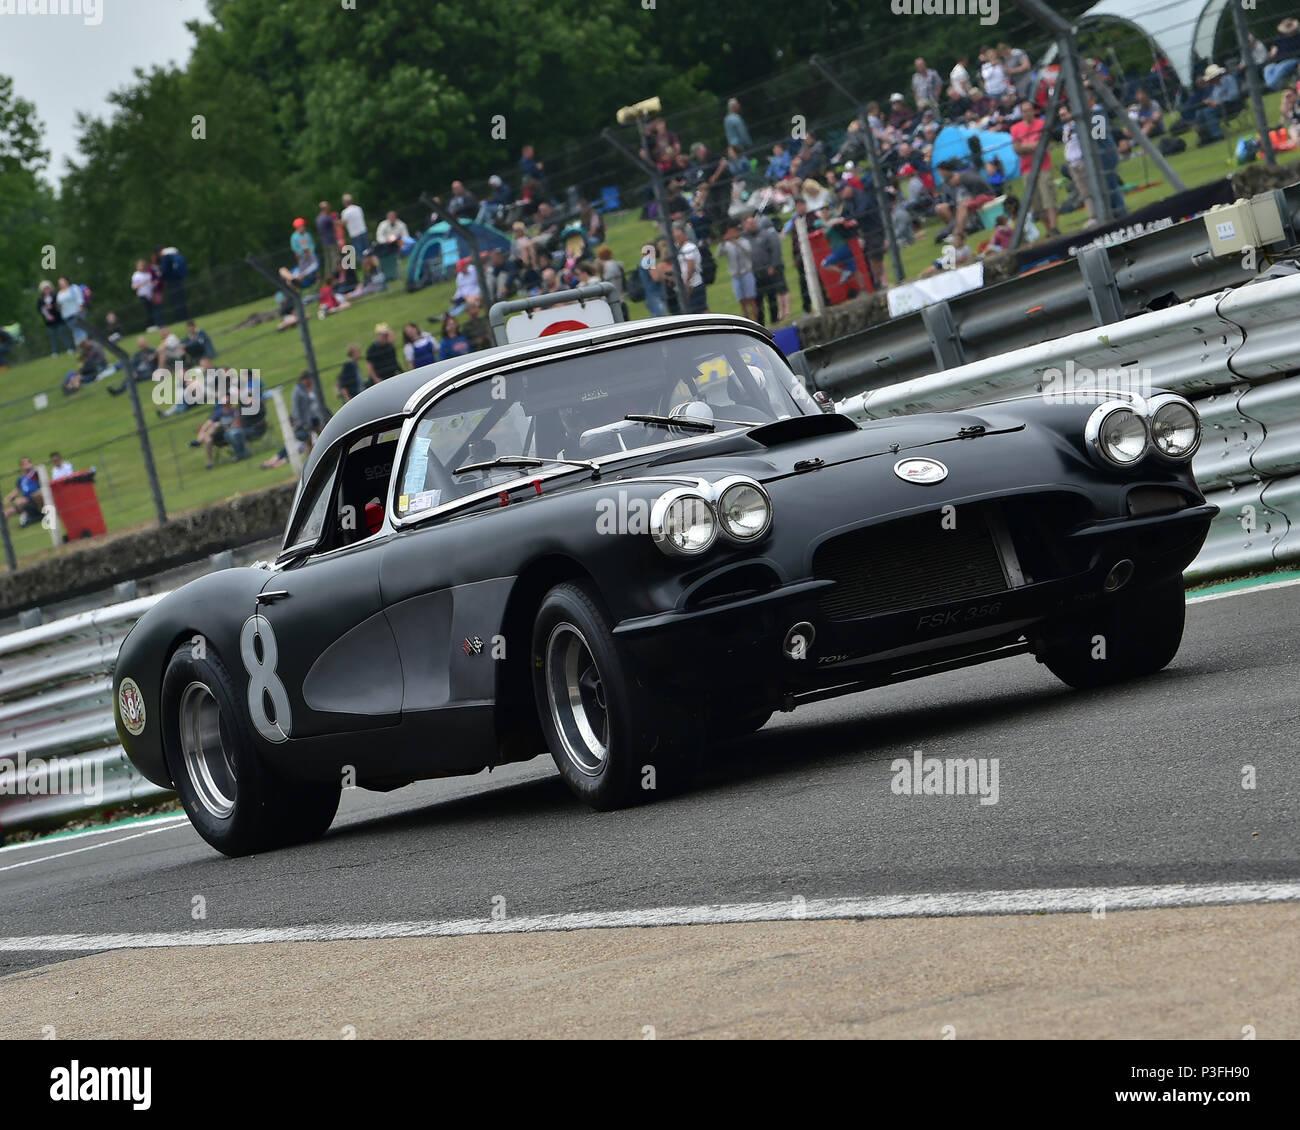 Simeon Chodosh Chevrolet Corvette Bernie S V8s Us Muscle Cars